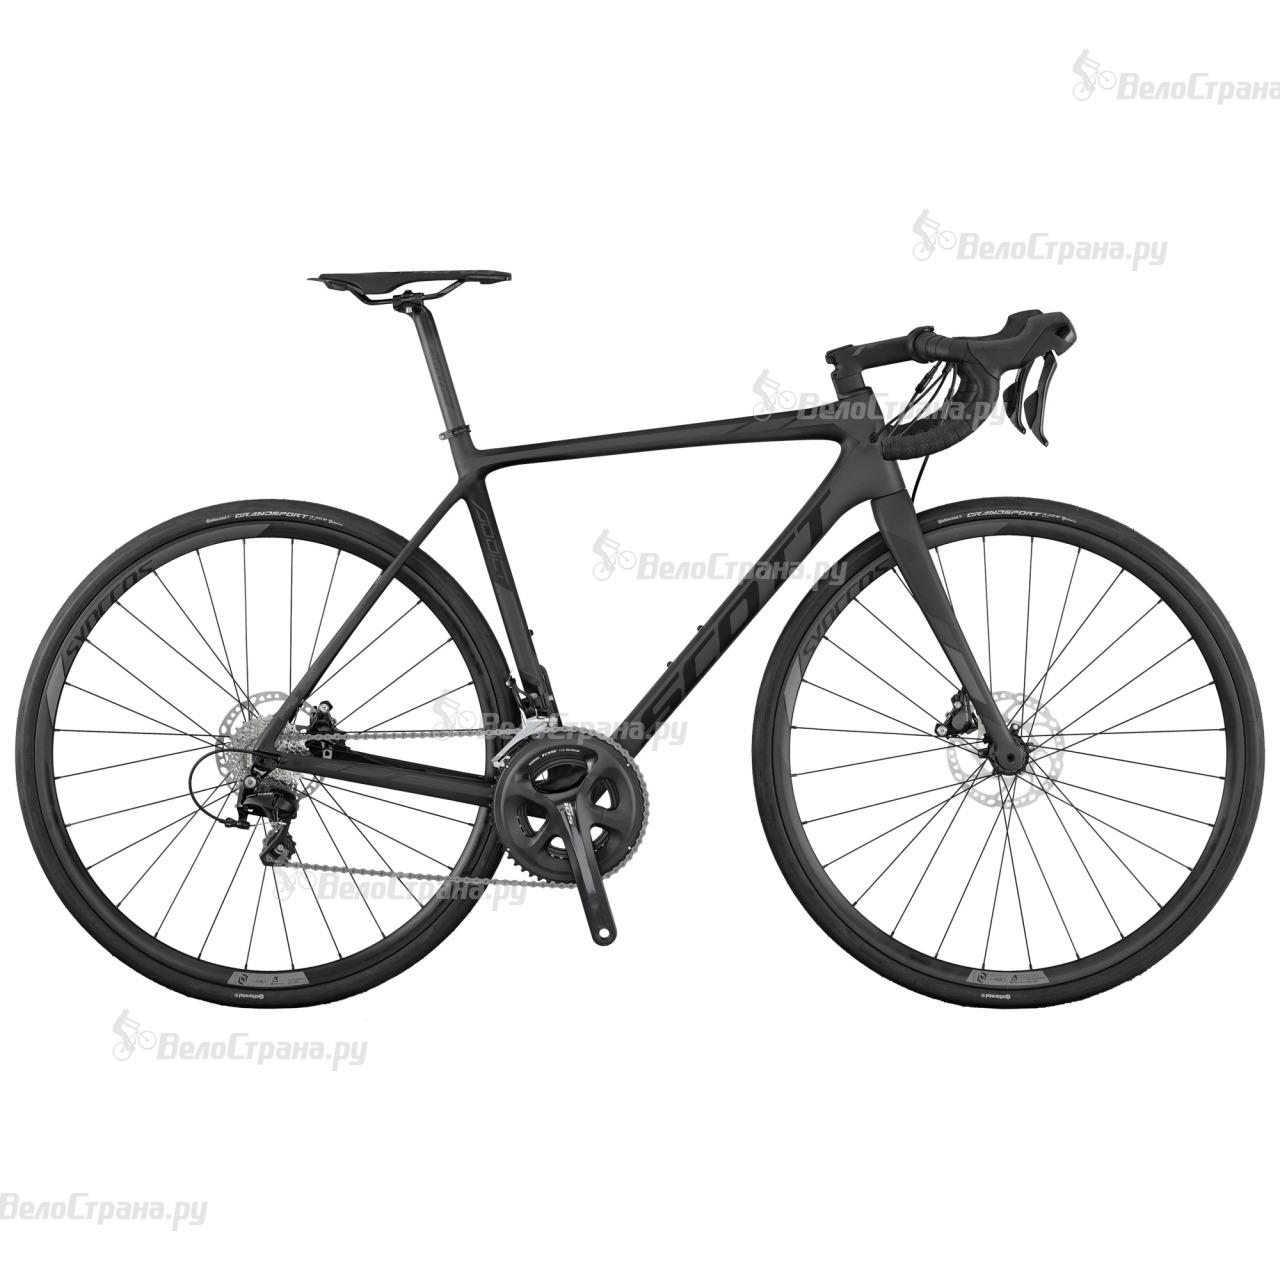 Велосипед Scott Addict 30 Disc (2017) scott addict sl compact 2015